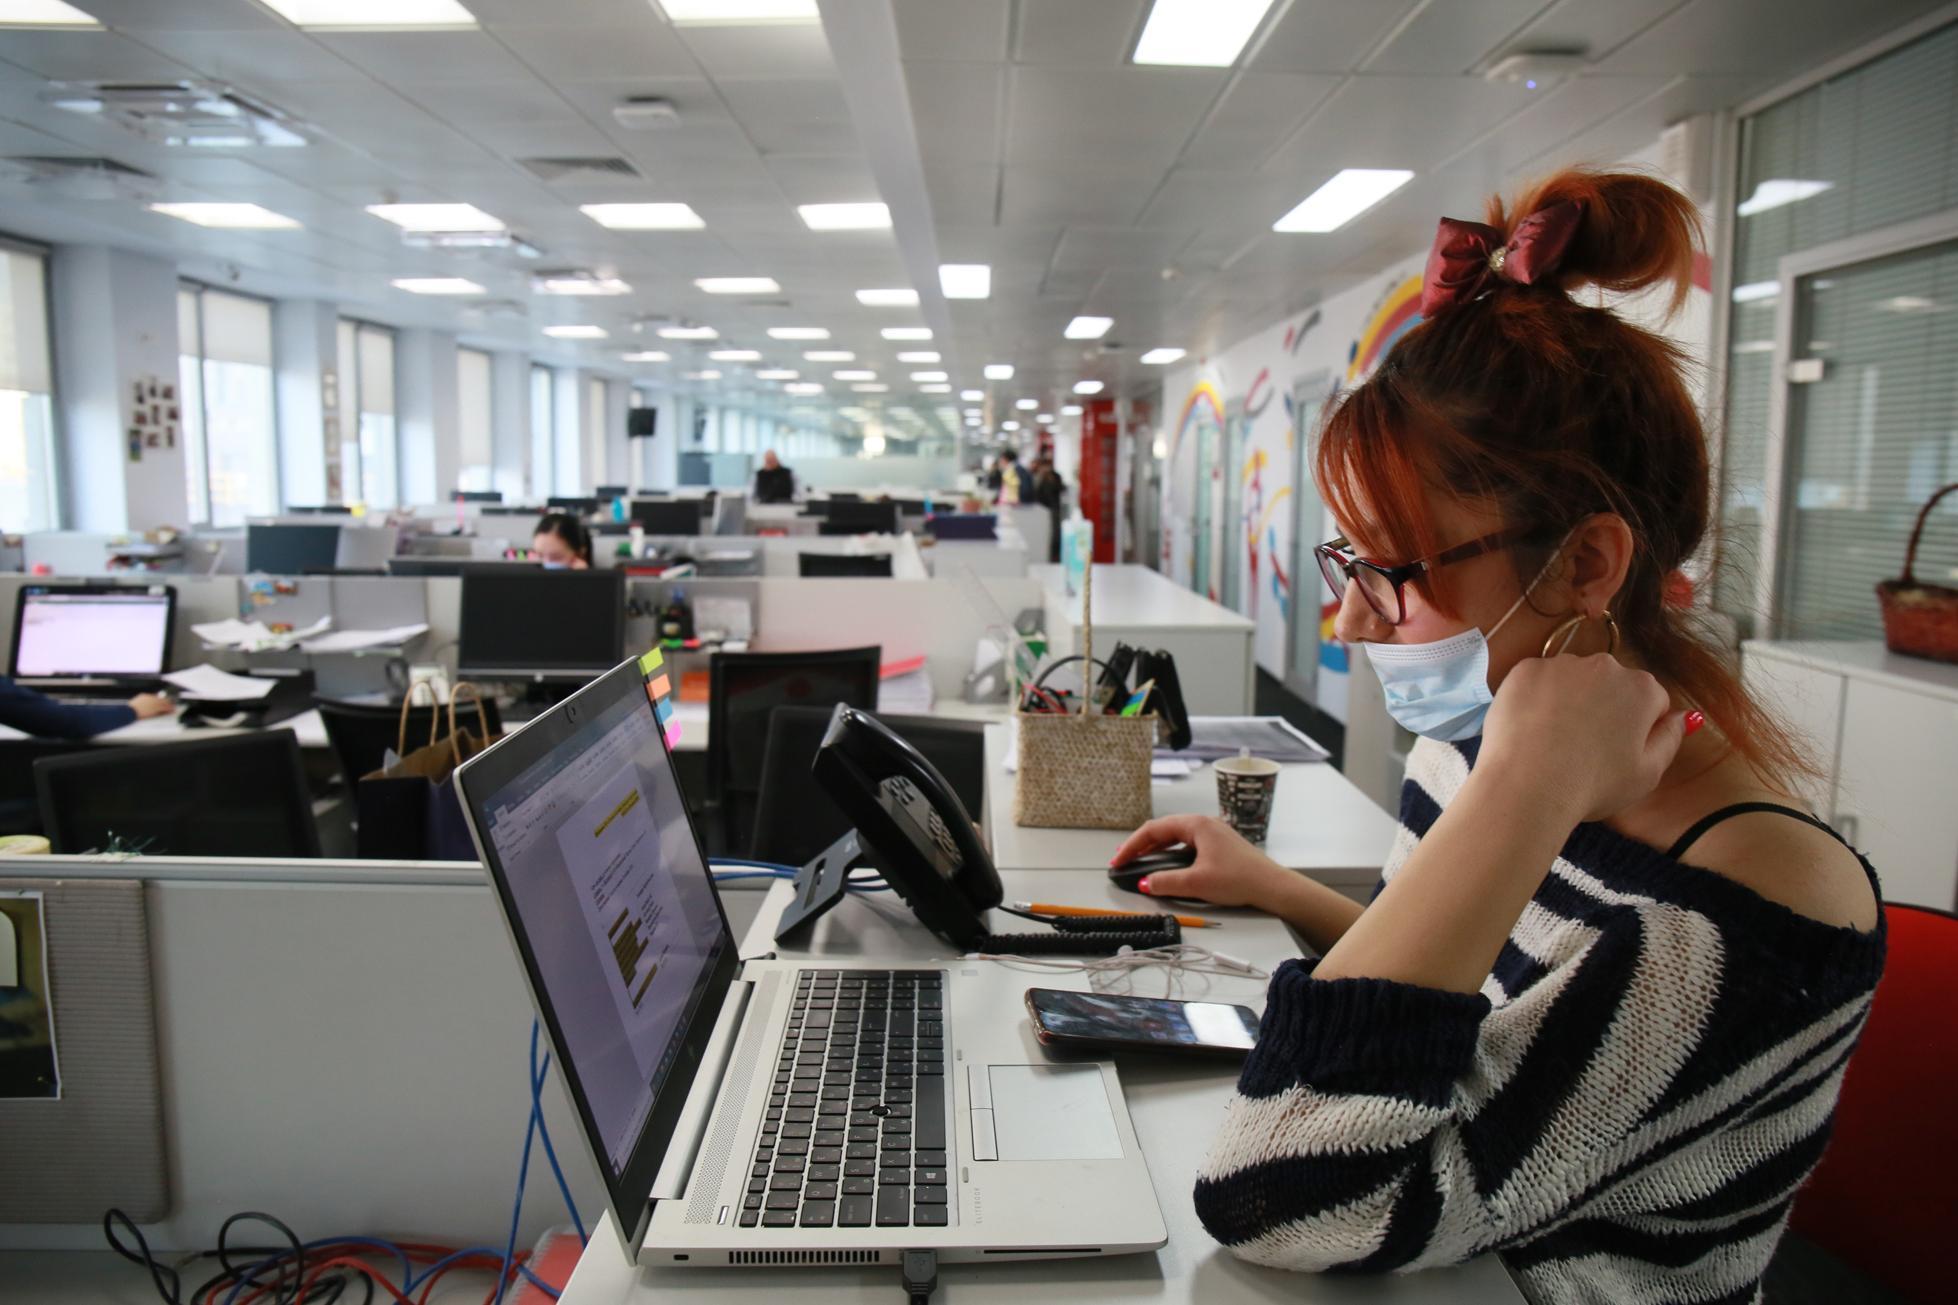 KAZAKHSTAN-INTERPRISES-BANKING